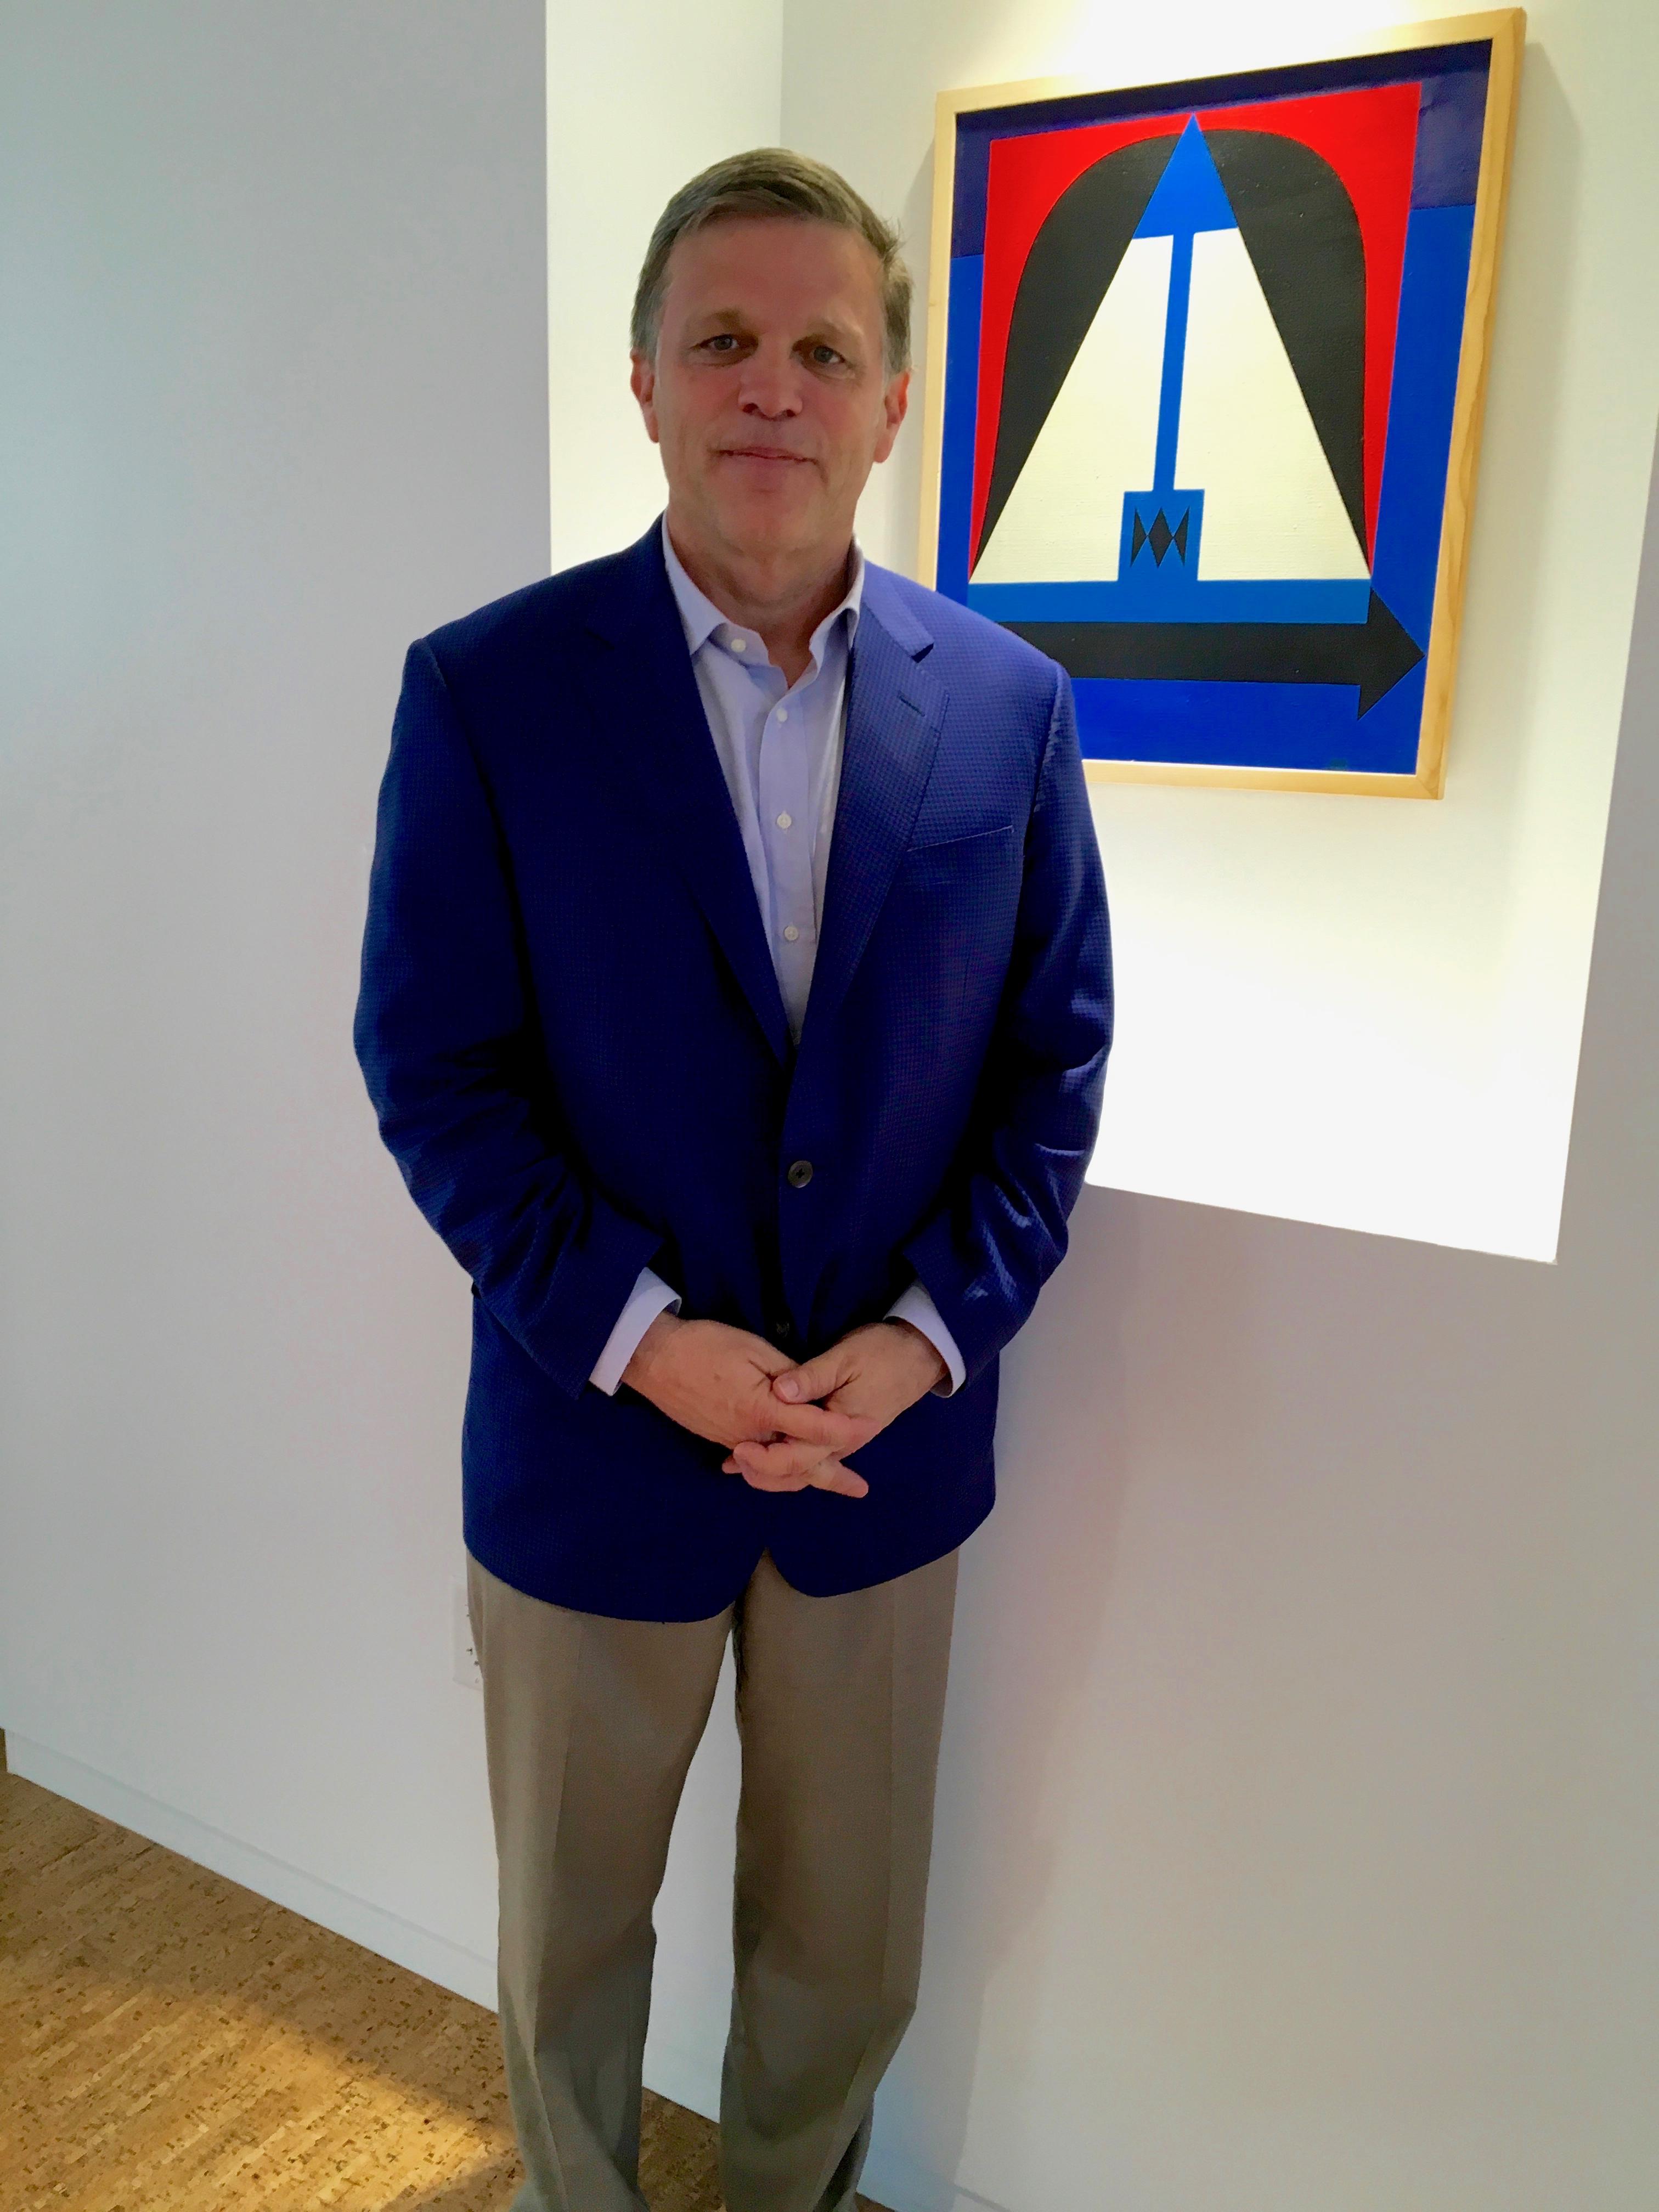 Douglas Brinkley Art Palm Beach California